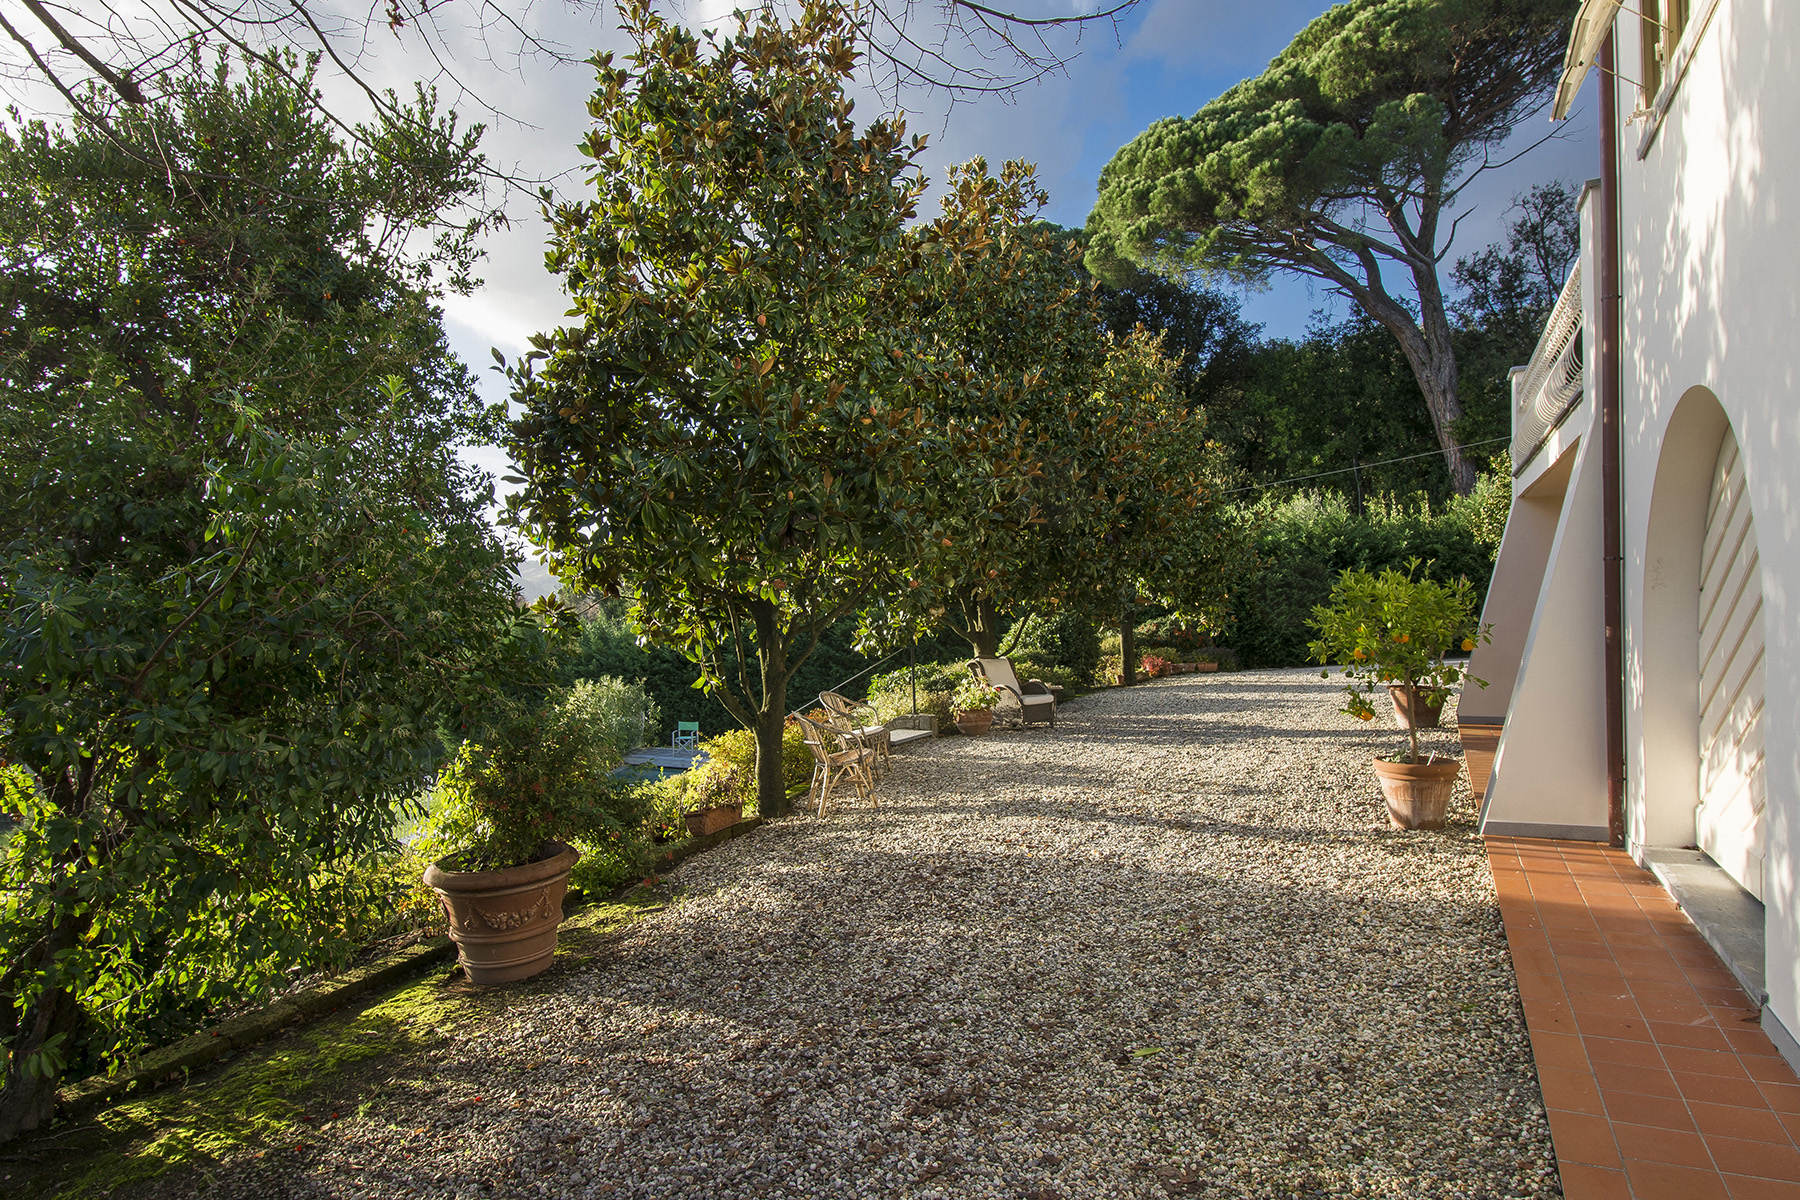 Villa in Vendita a Lucca: 5 locali, 470 mq - Foto 26